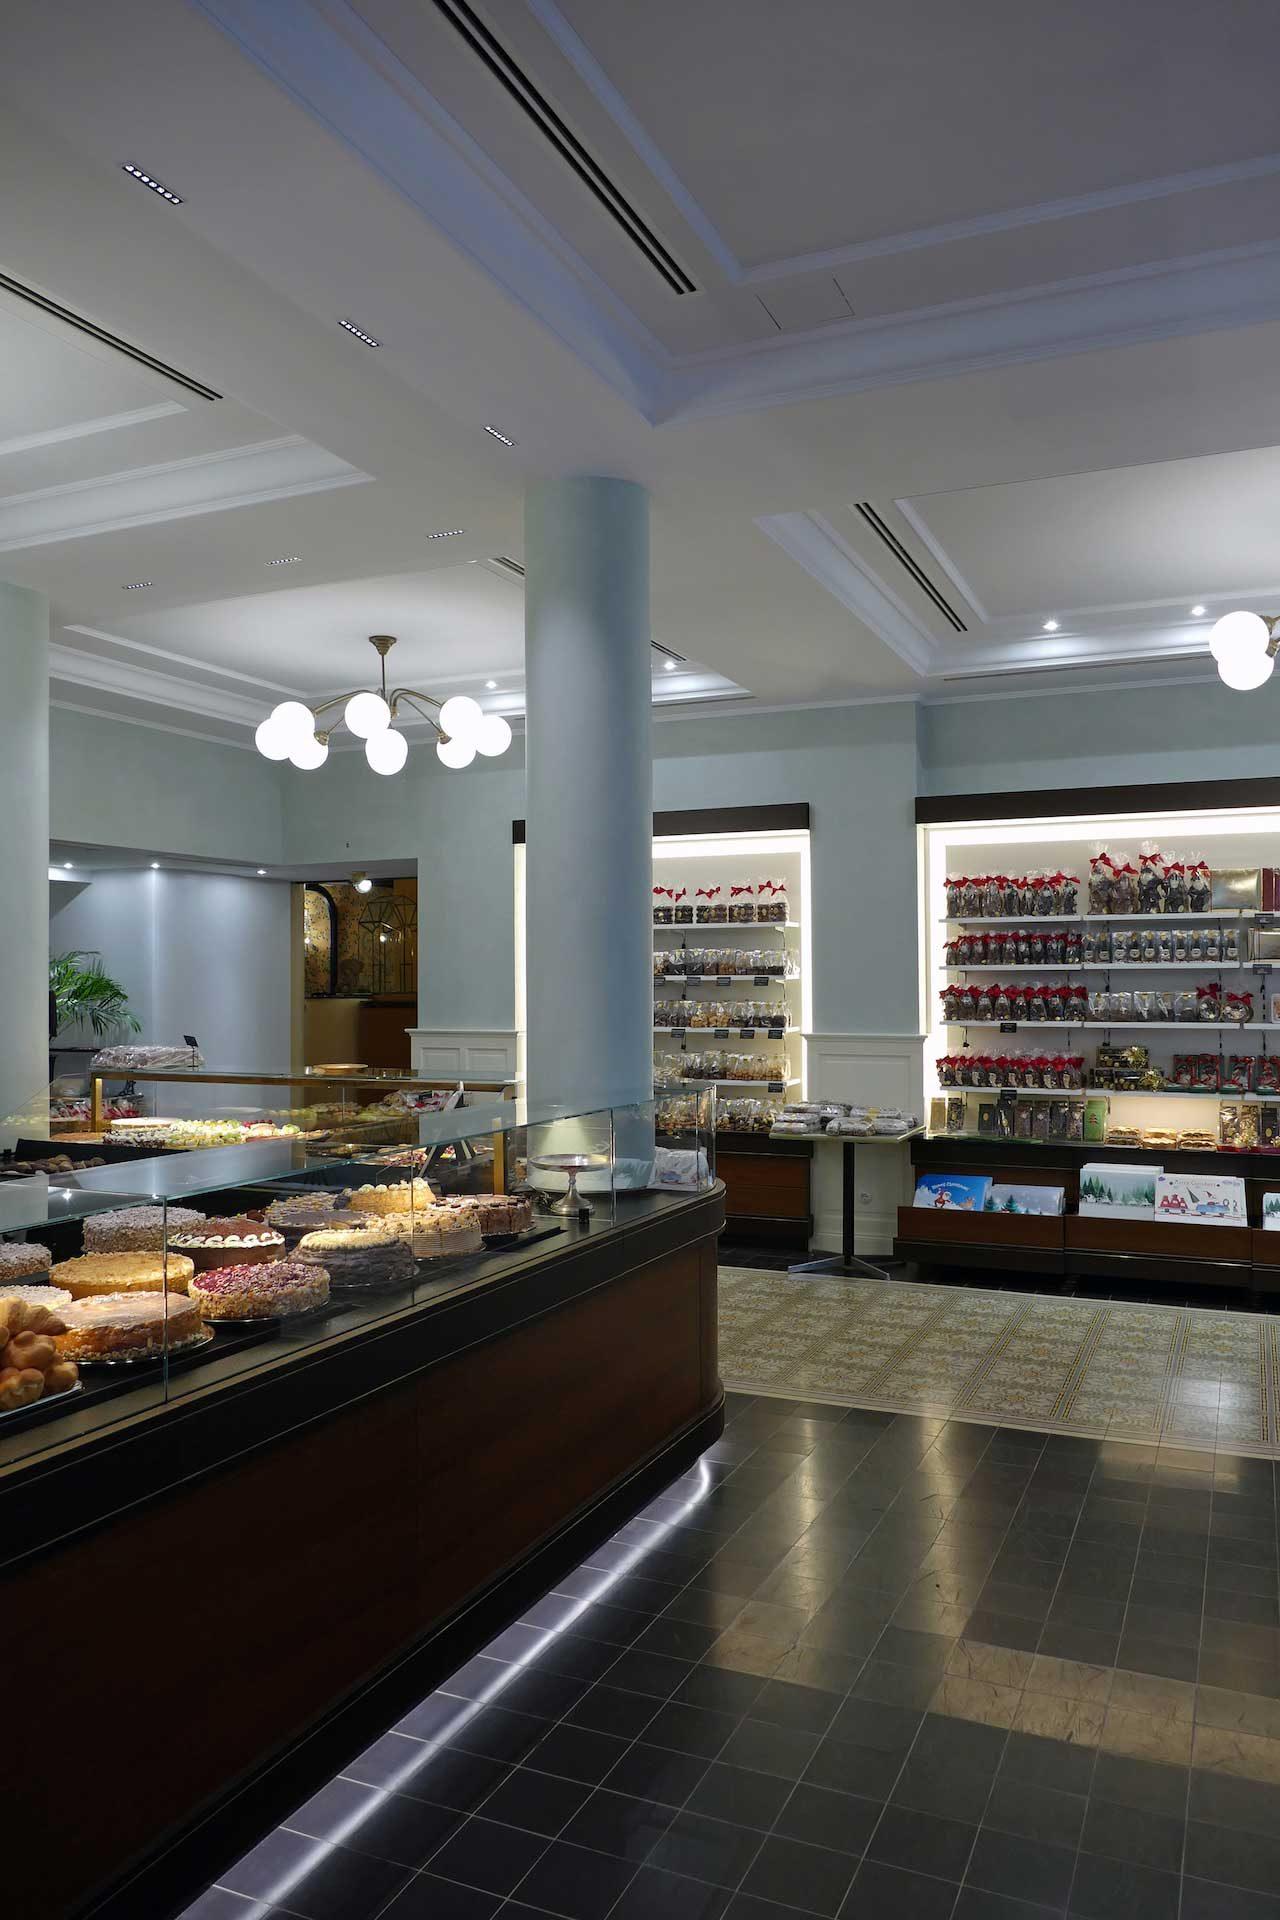 Café Konditorei Schafheutle in Heidelberg